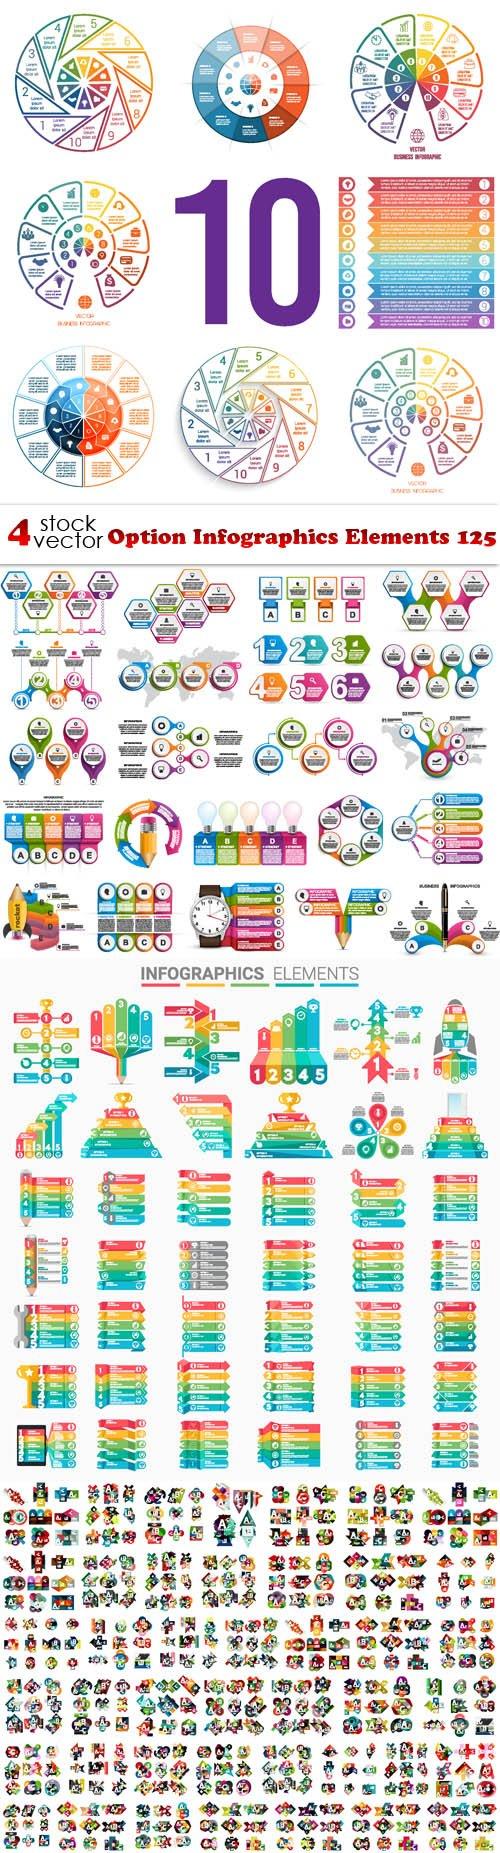 Vectors - Option Infographics Elements 125